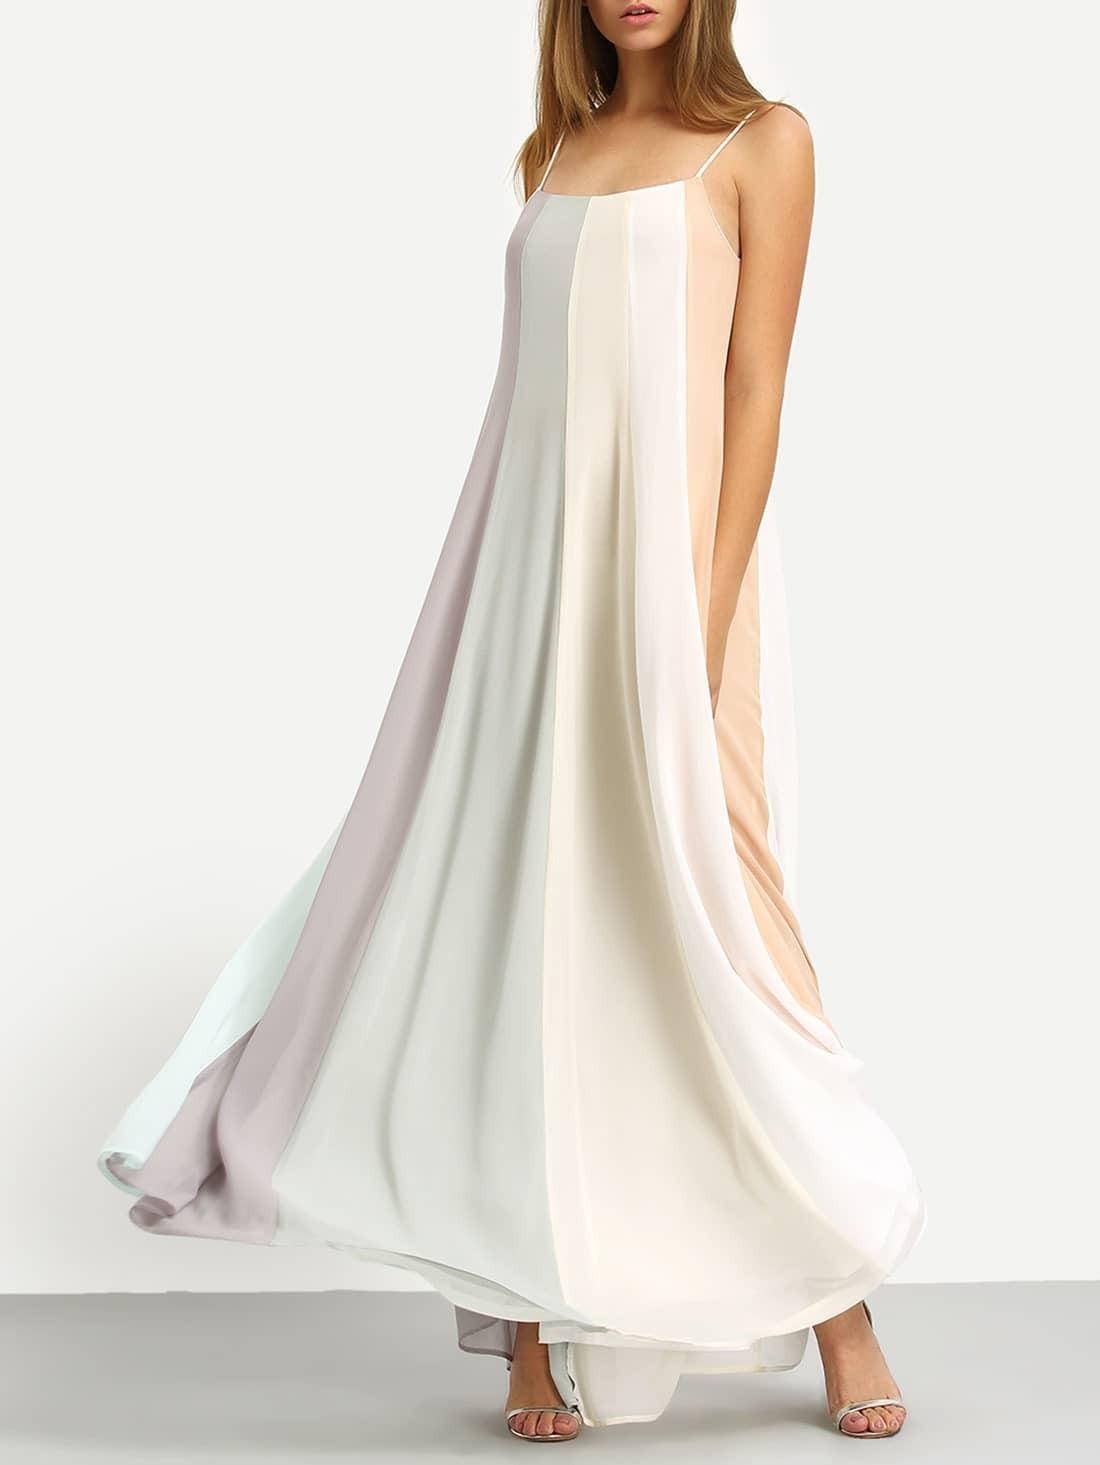 Multicolor Patchwork Spaghetti Strap Maxi Dress EmmaCloth-Women ...